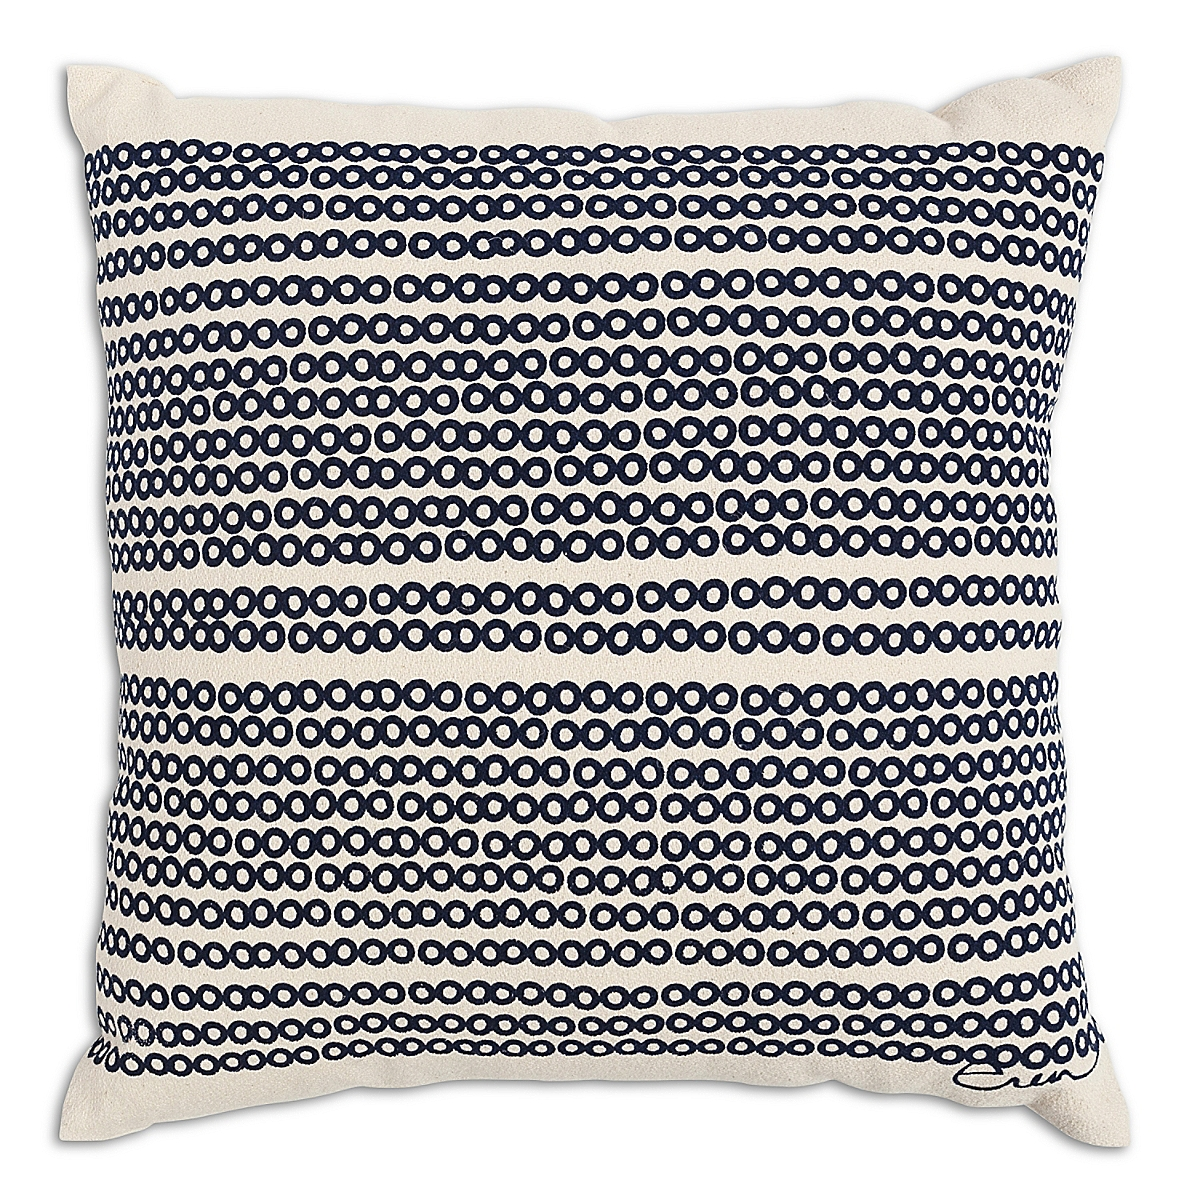 "20"" x 20"" - Decco Dots Pillow: Navy"